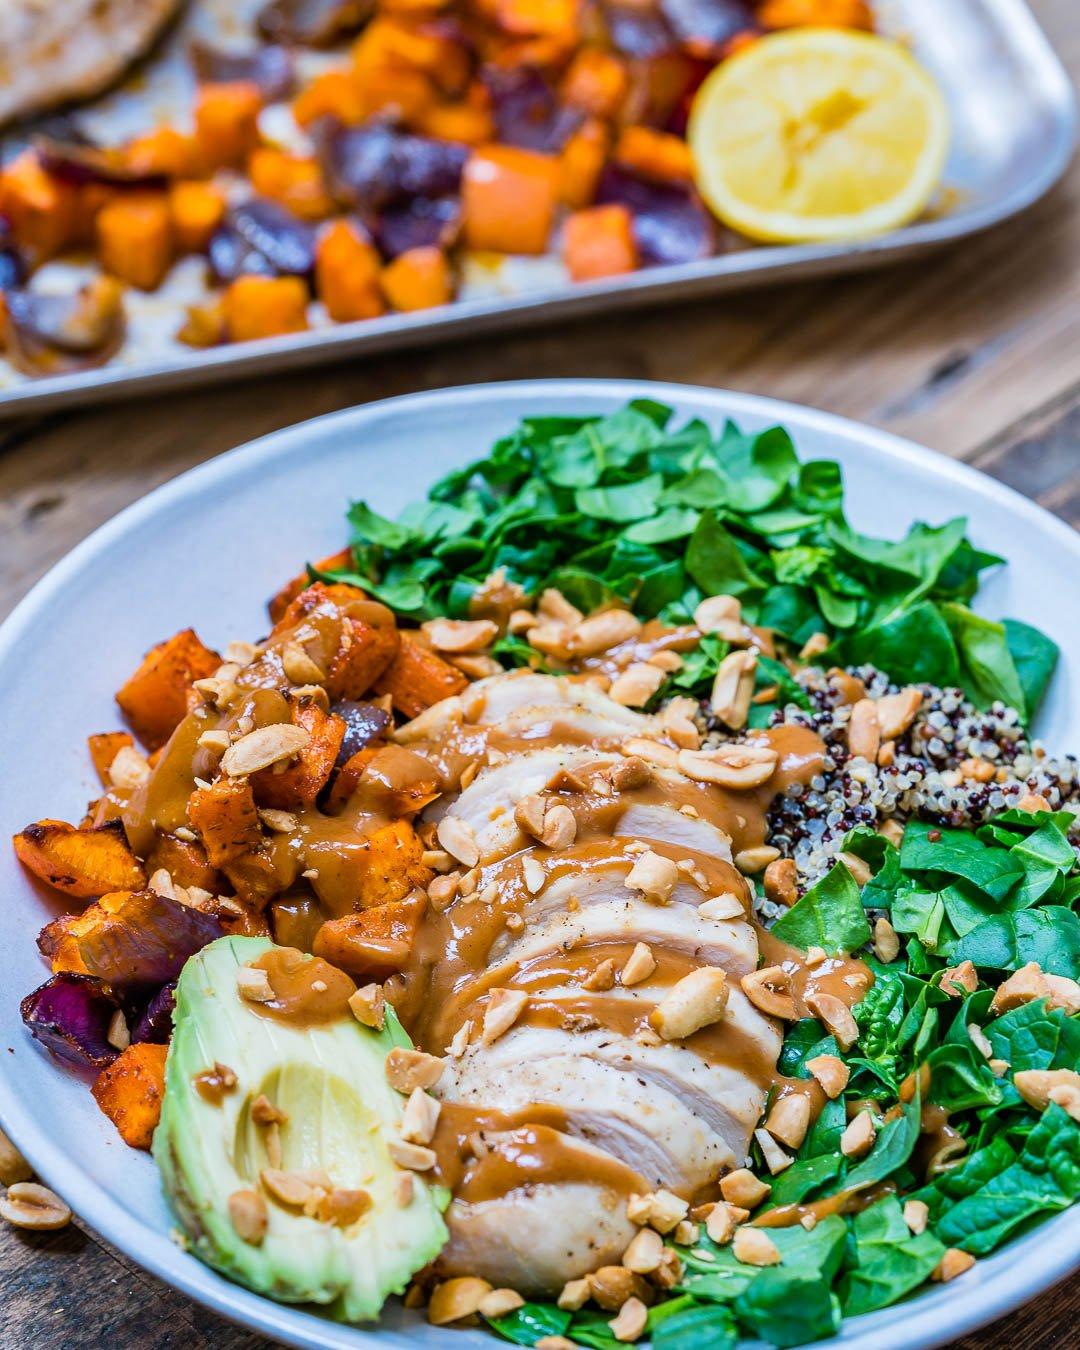 Salata De Pui Cu Legume La Cuptor si Quinoa - Reteta Video 7